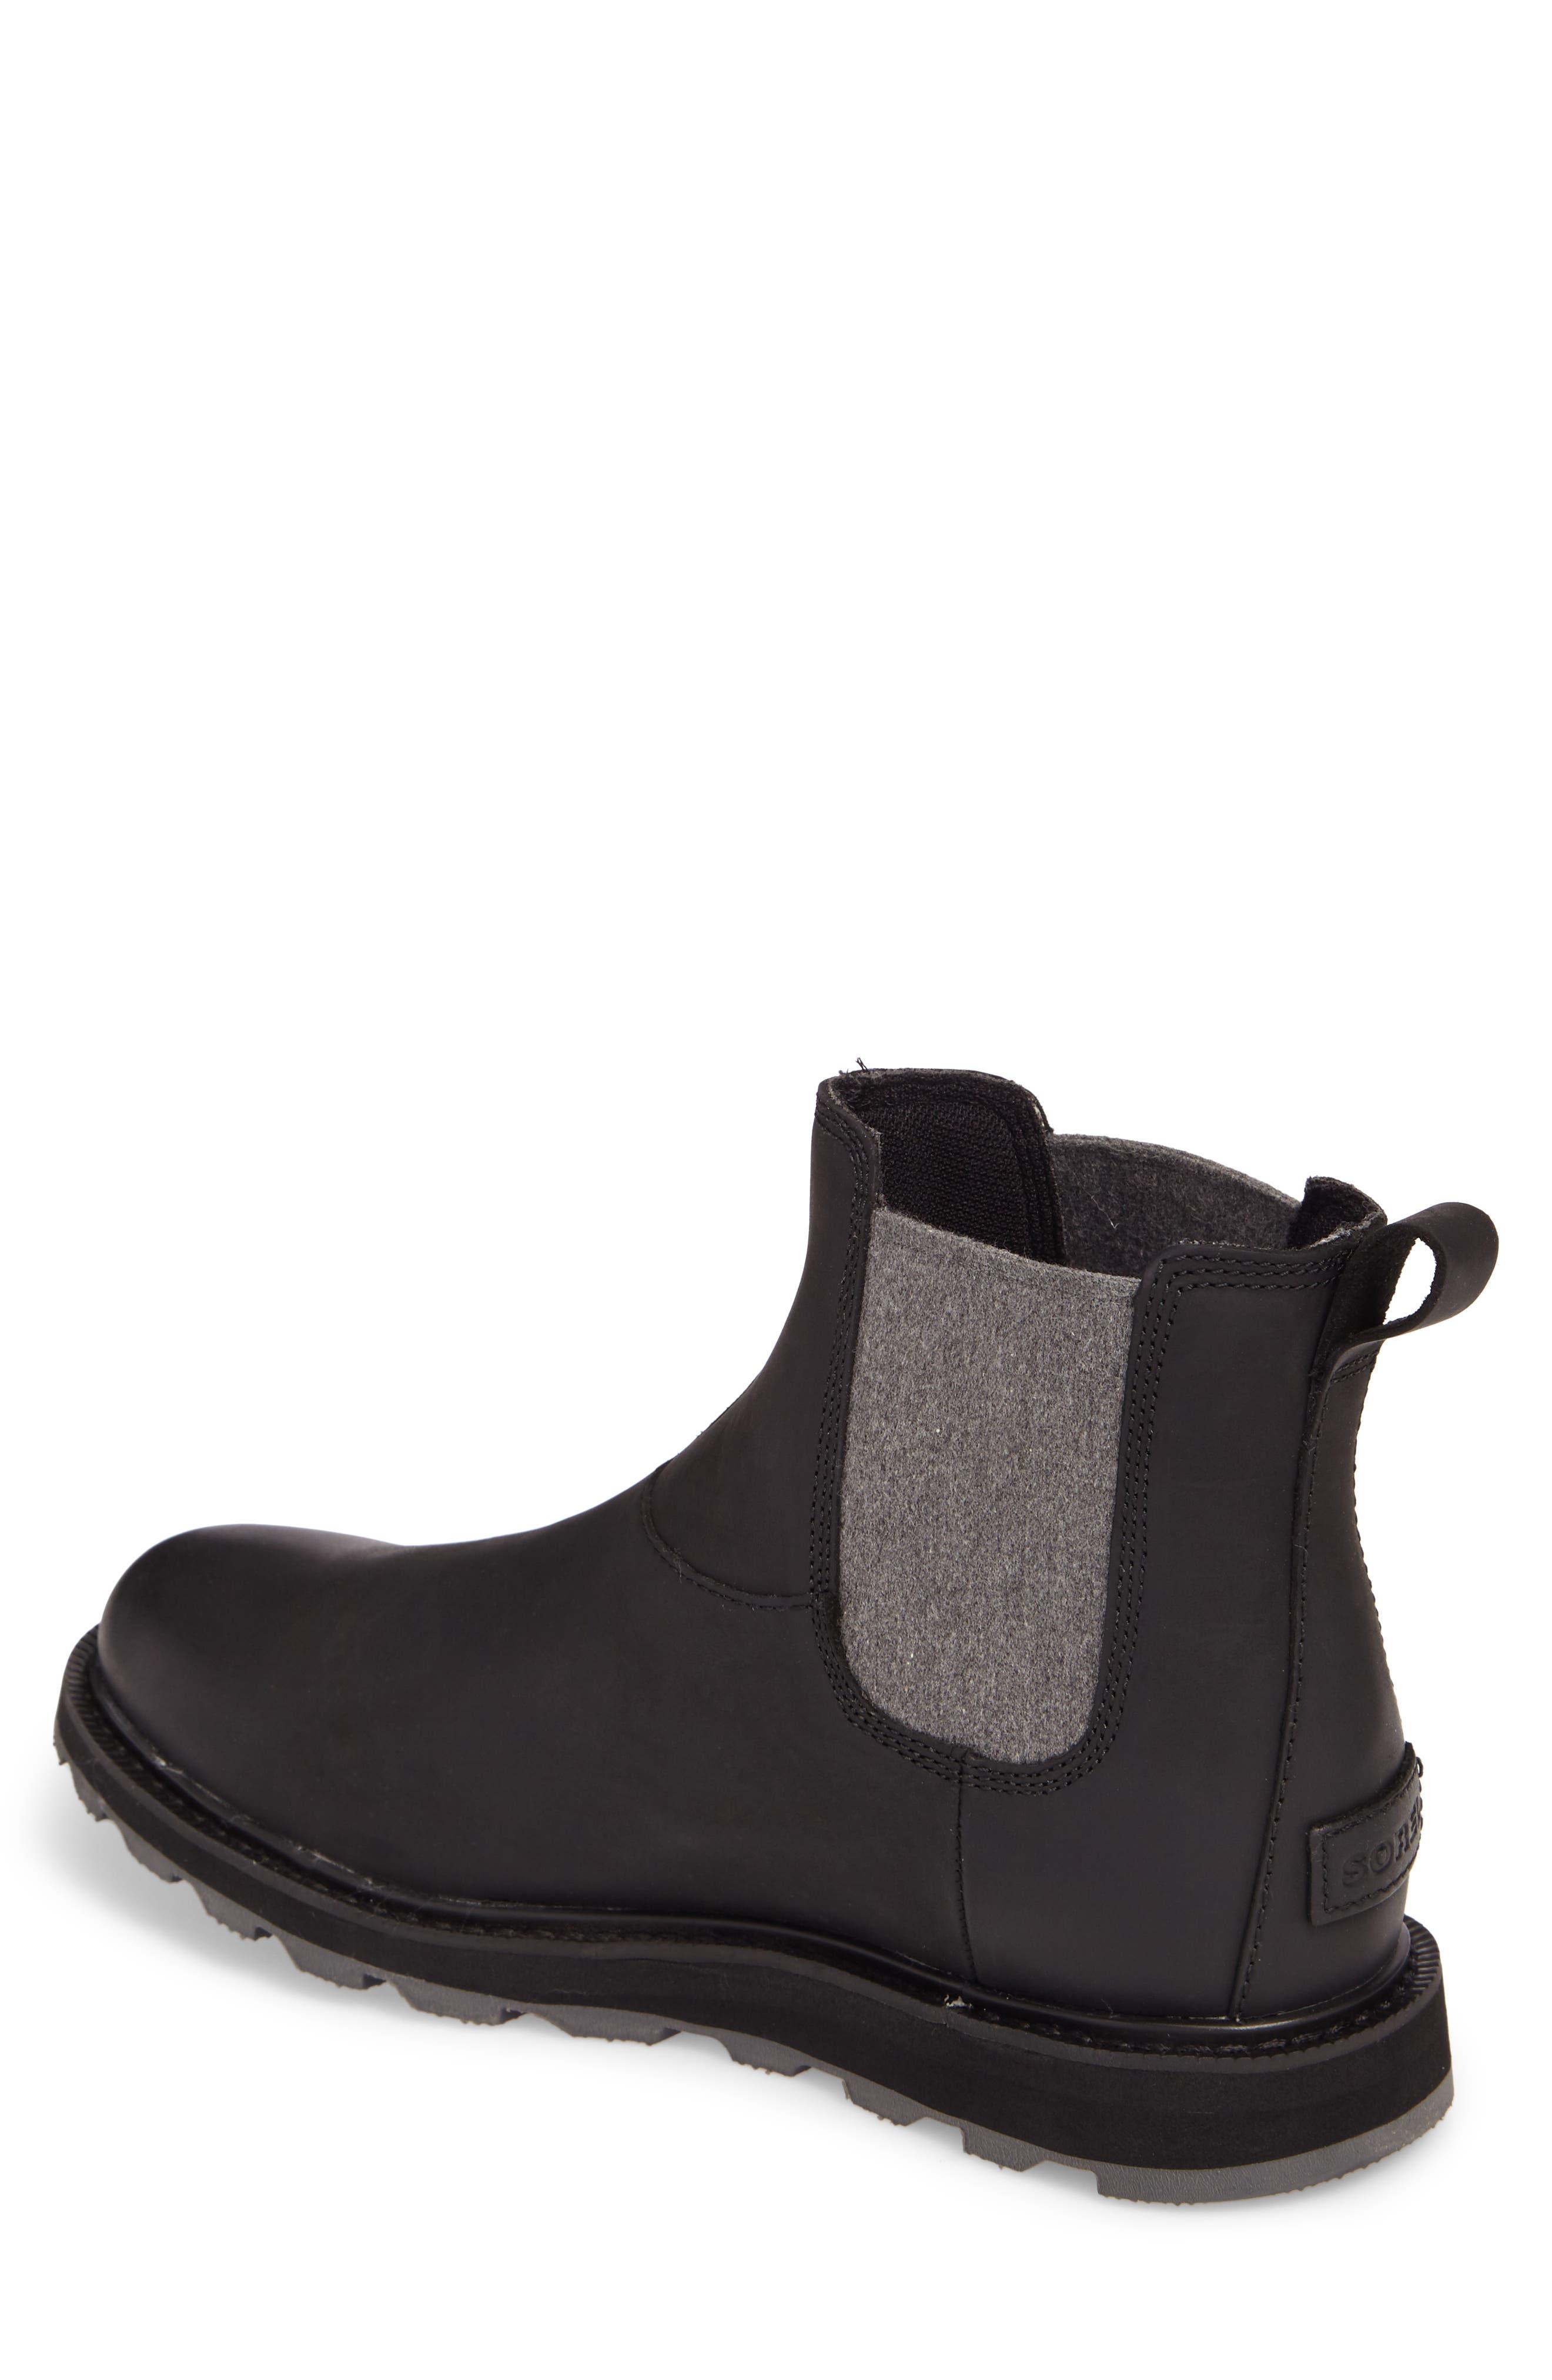 Madson Waterproof Chelsea Boot,                             Alternate thumbnail 2, color,                             Black